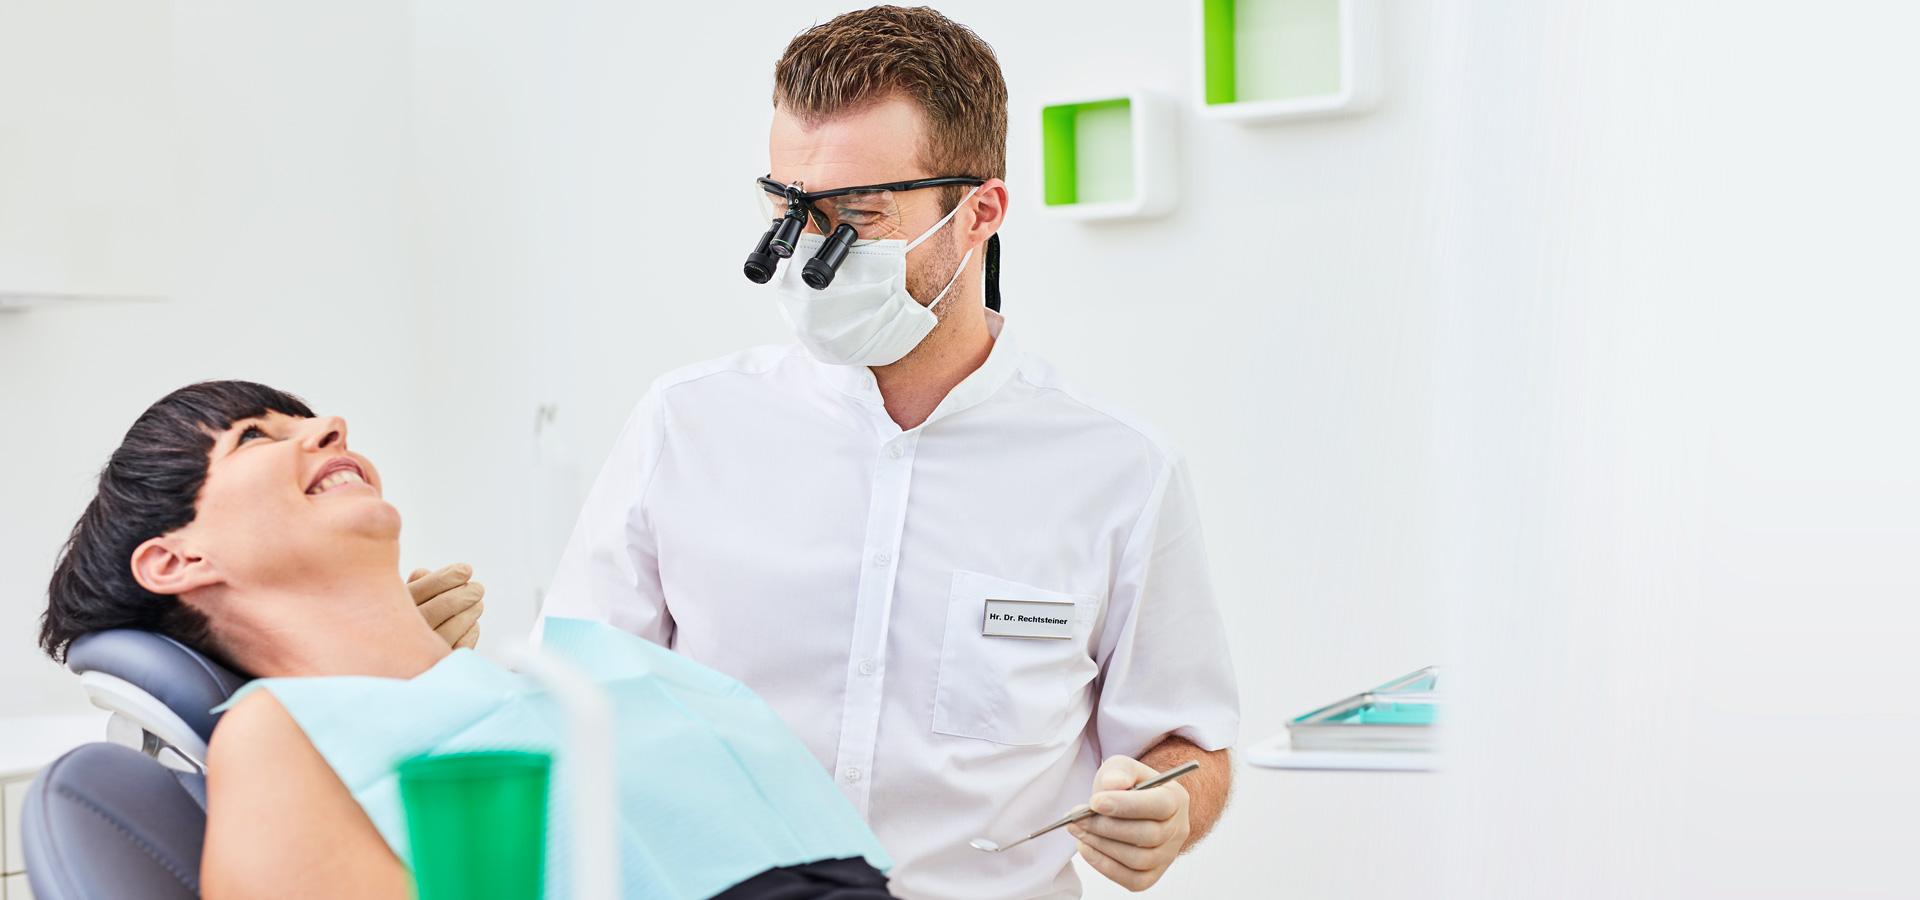 Zahnärzte Neubulach - Parodontitis-Behandlung/Parodontologie 1